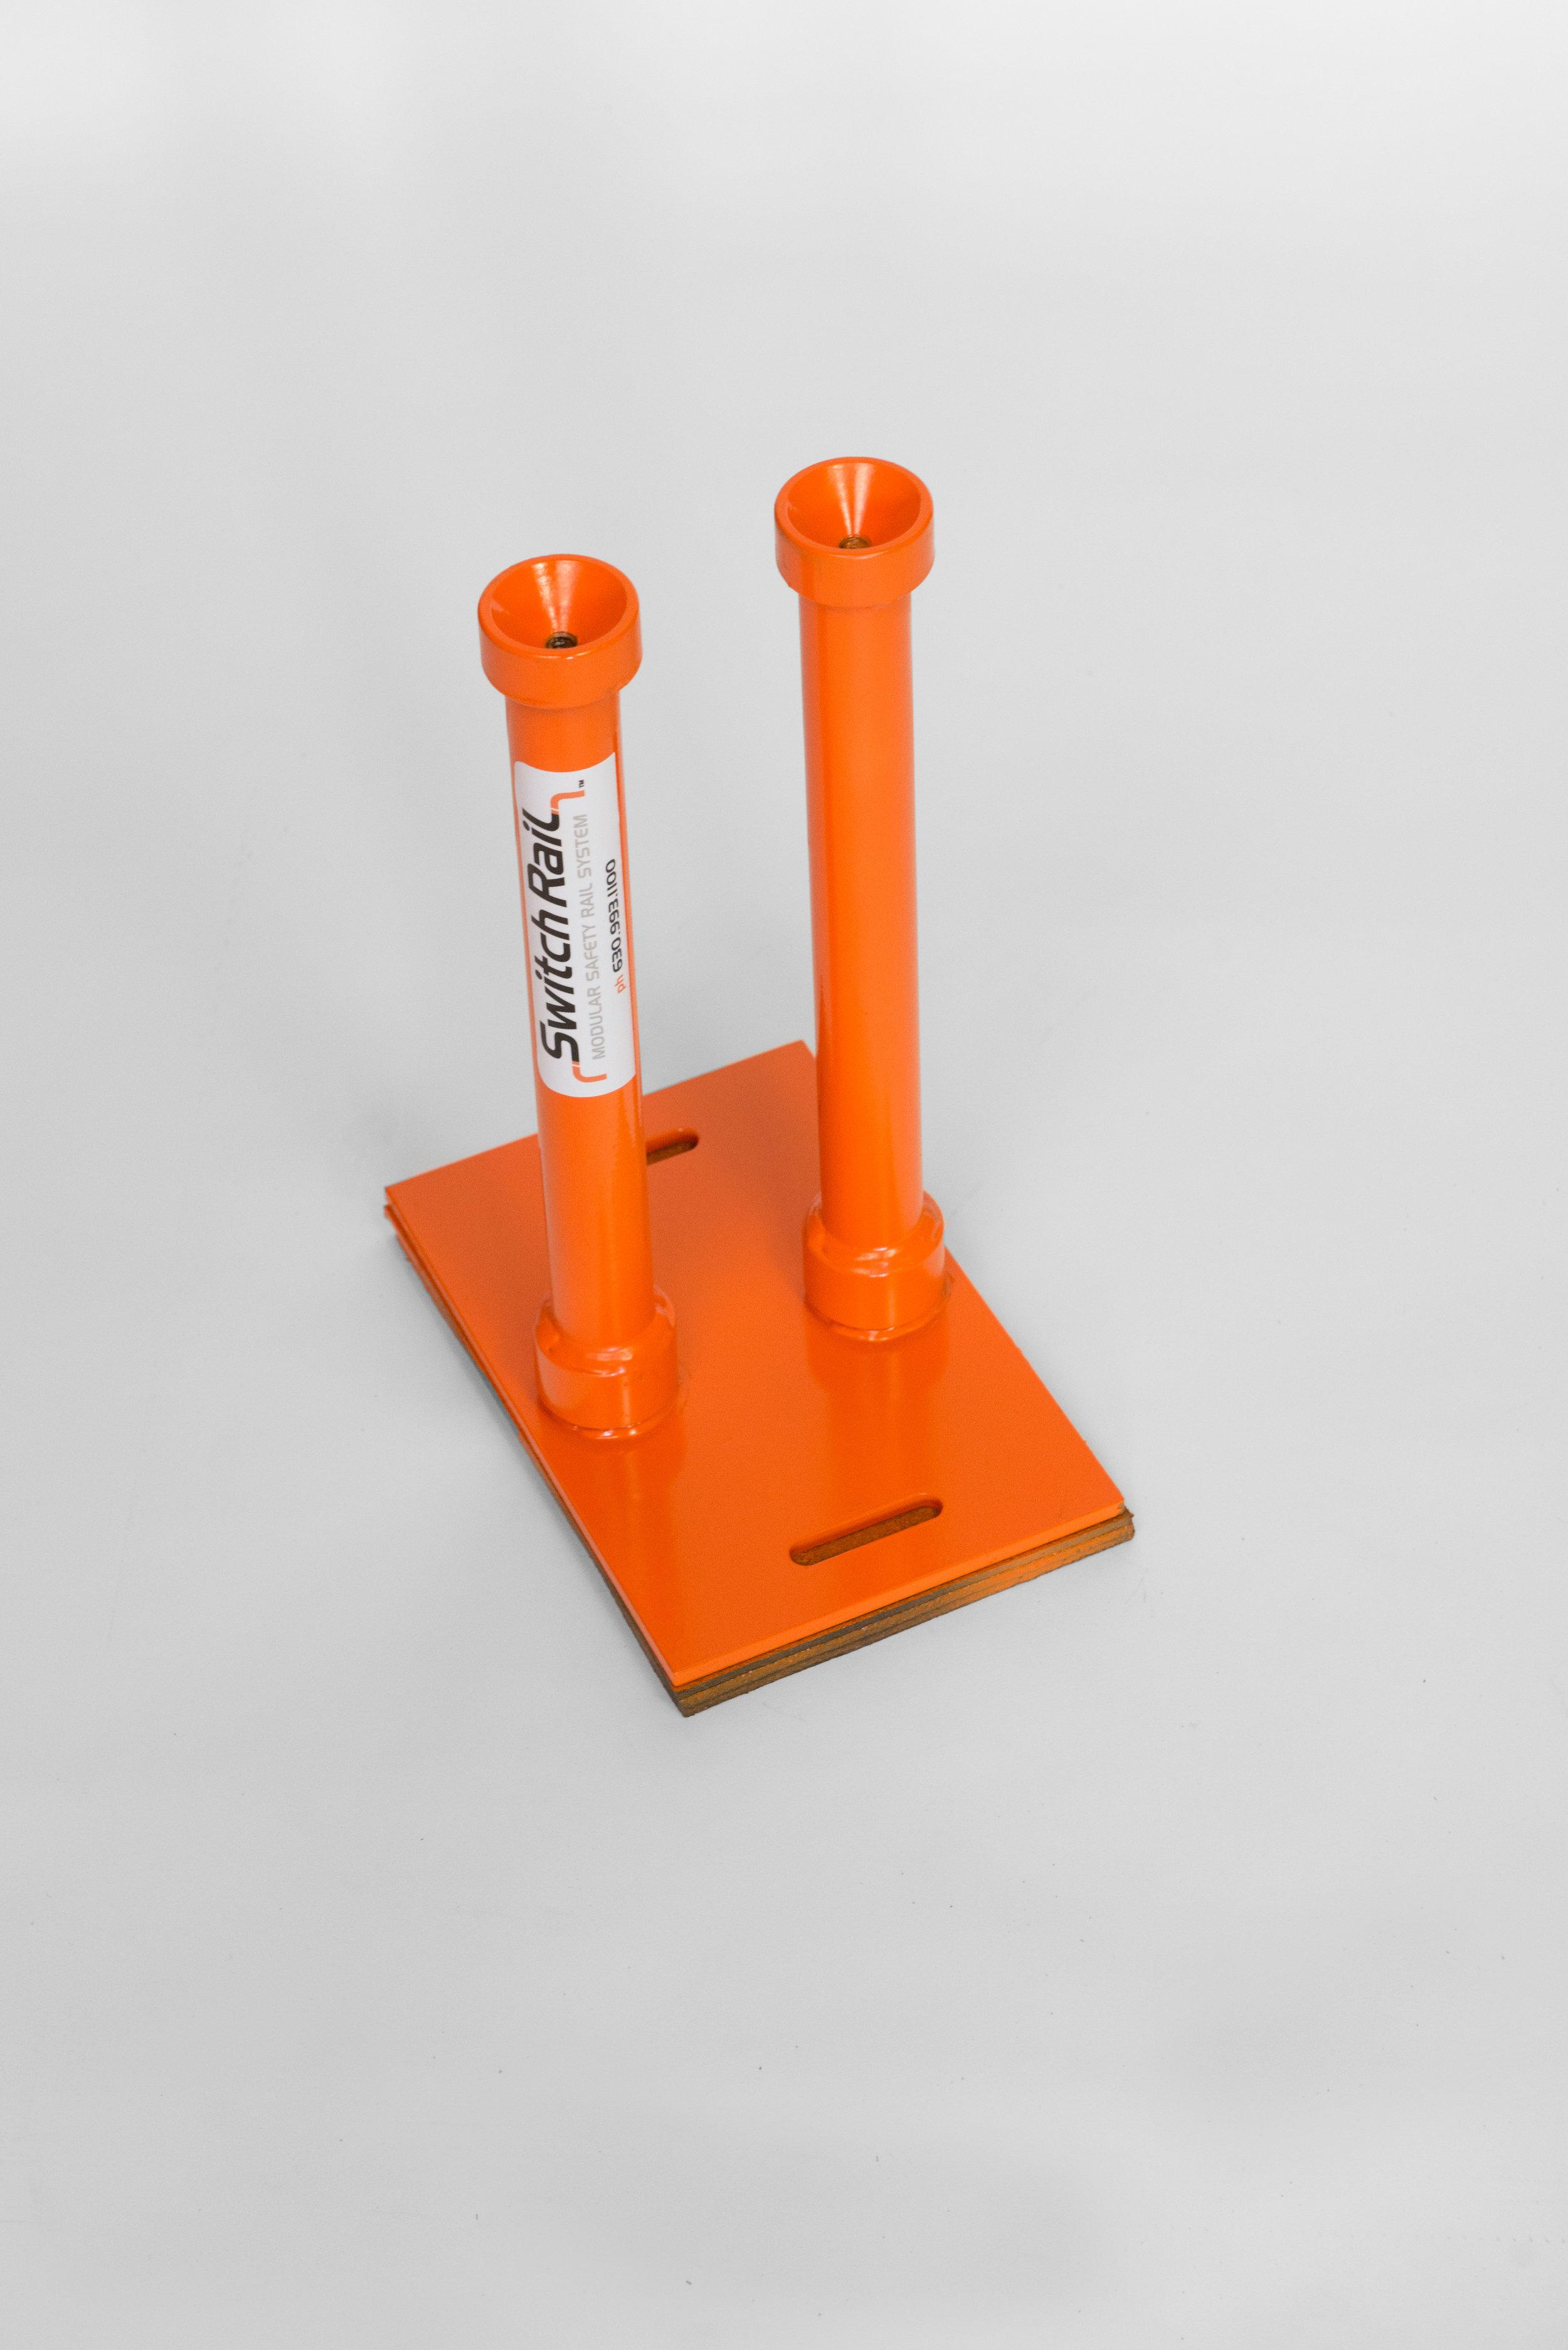 DSCRP - Double Stem Corner Plate